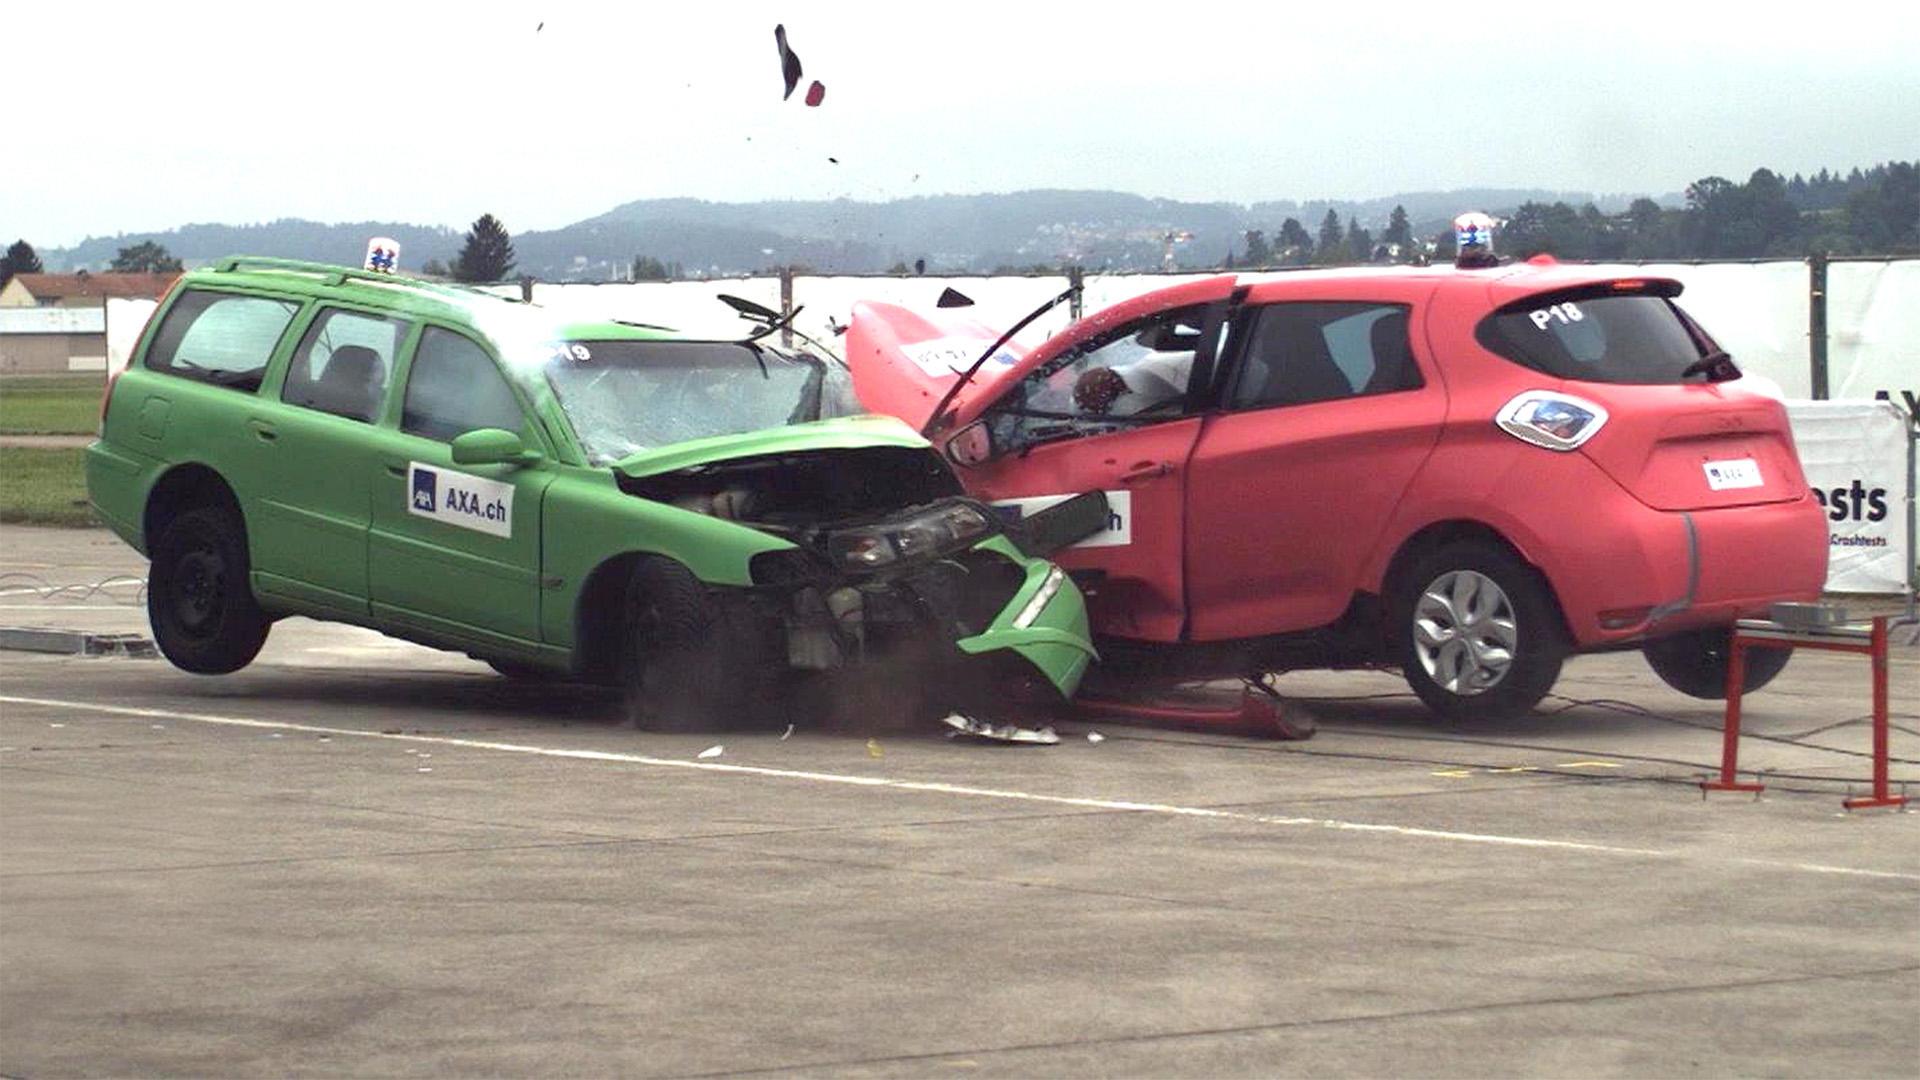 Thema heute u.a.: E-Auto Crashtest   Folge 42